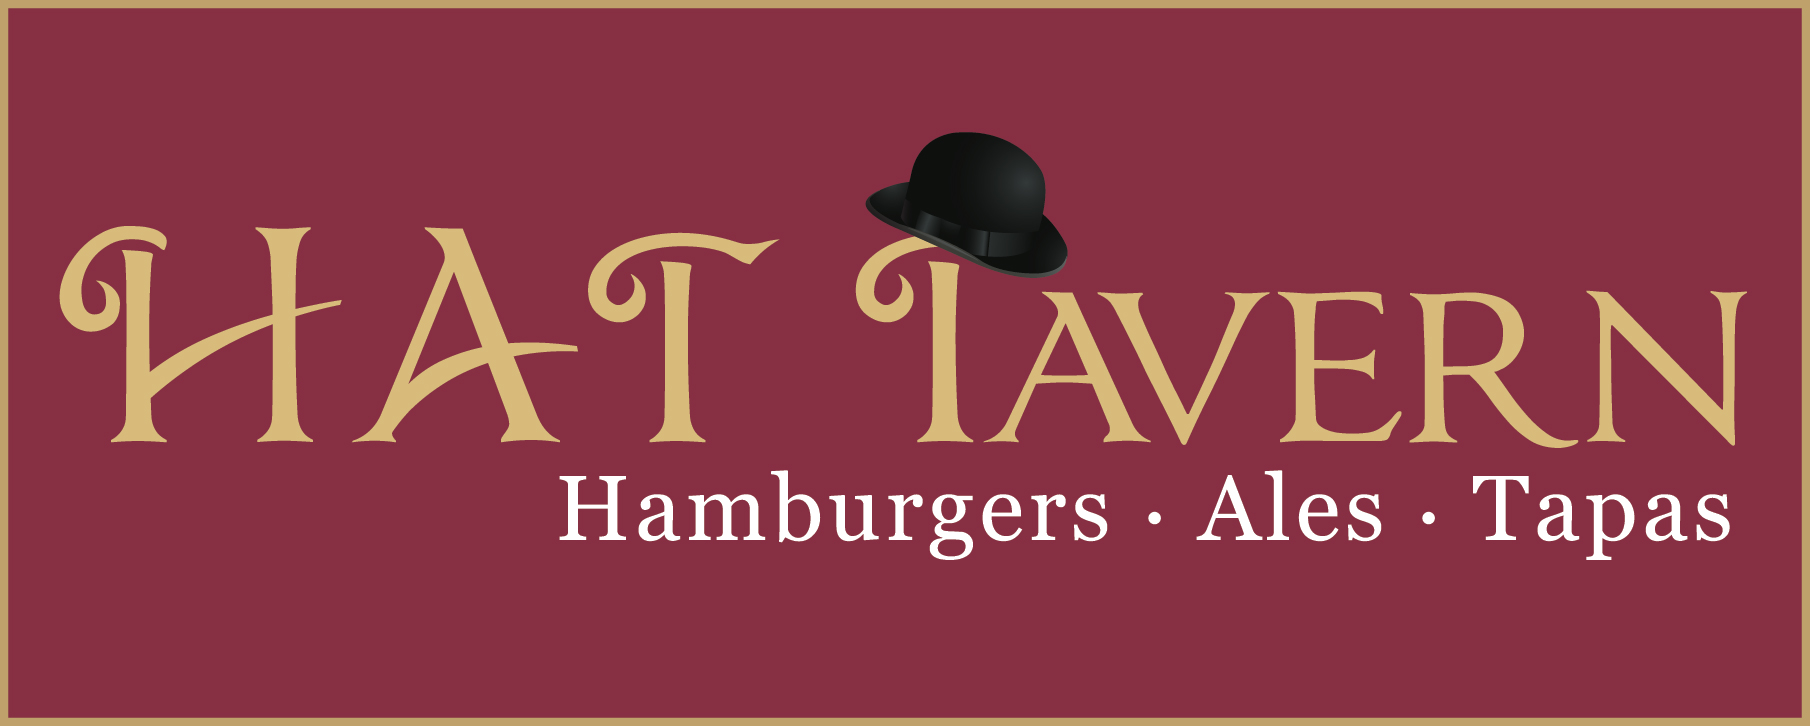 HAT Tavern